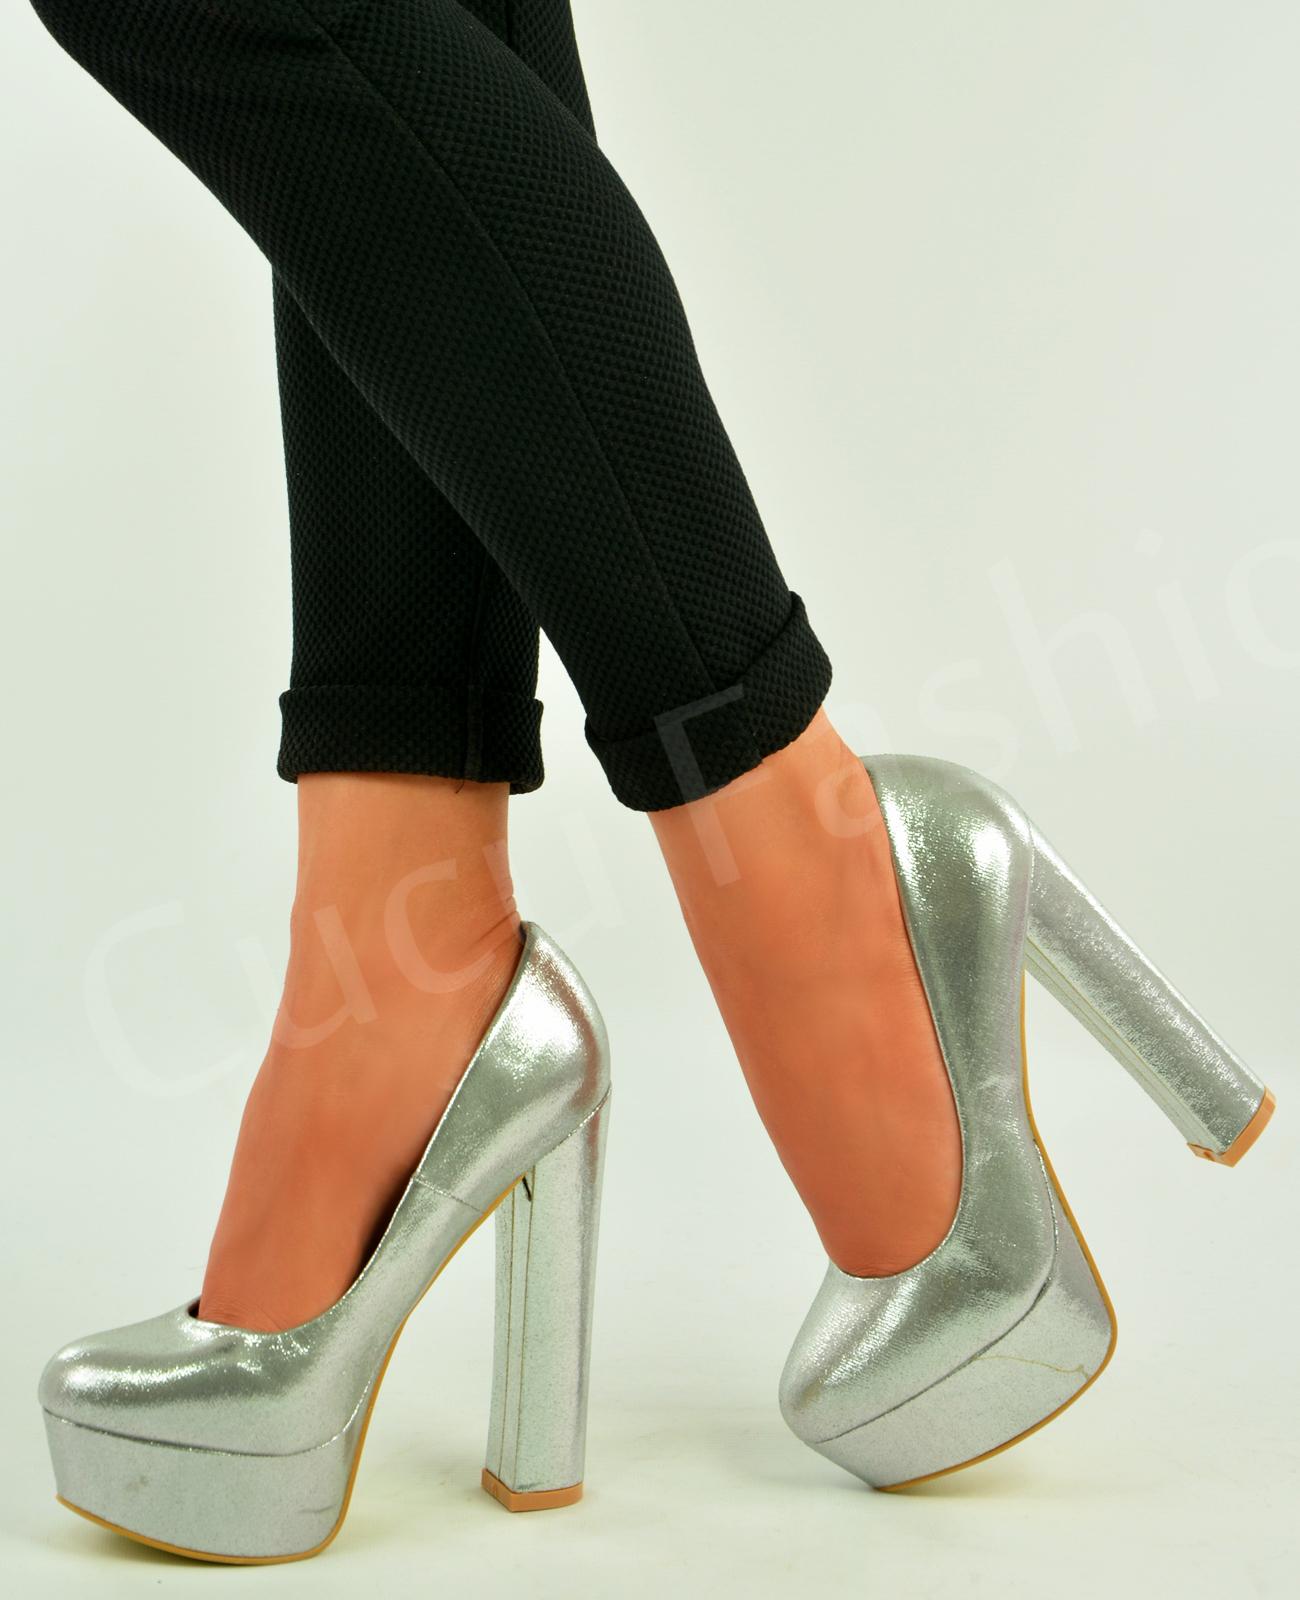 new womens platform pumps high block heel slip on